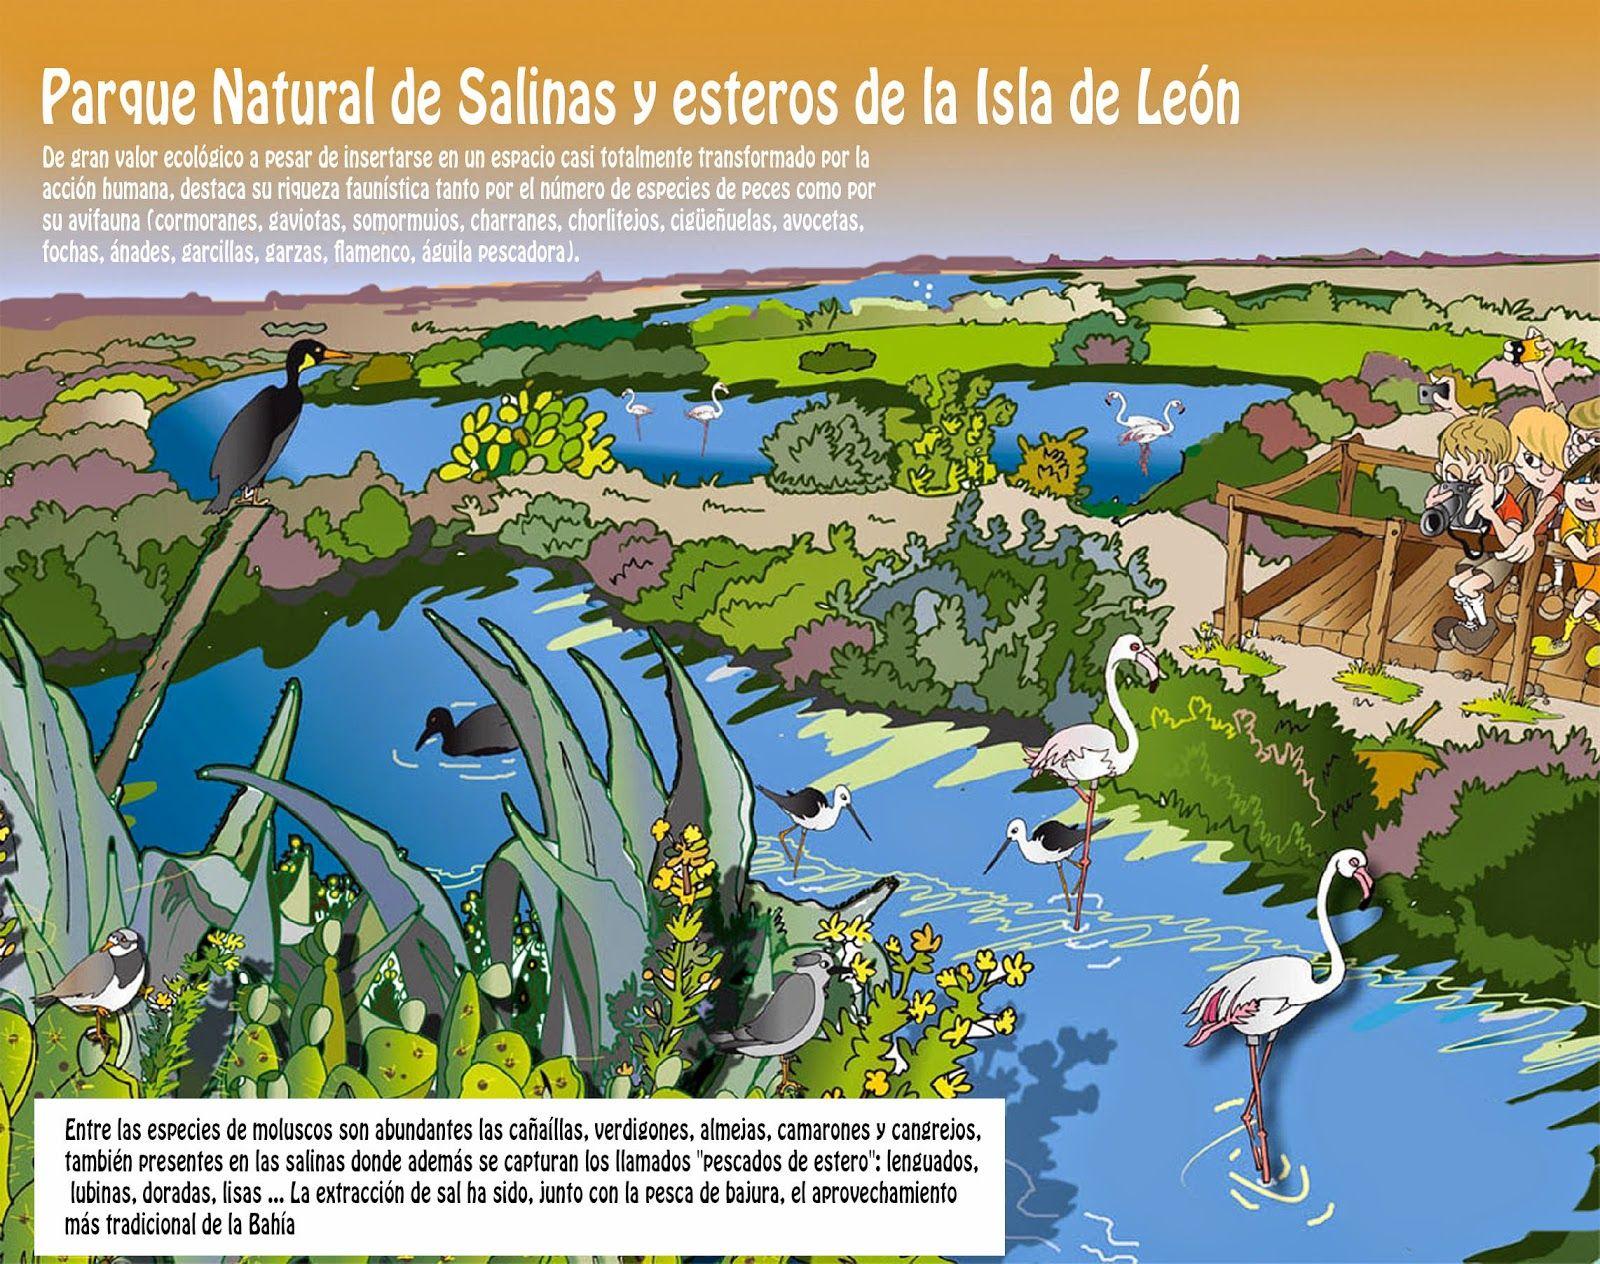 Parque natural de la isla de le n san fernando c diz for Isla leon piscina